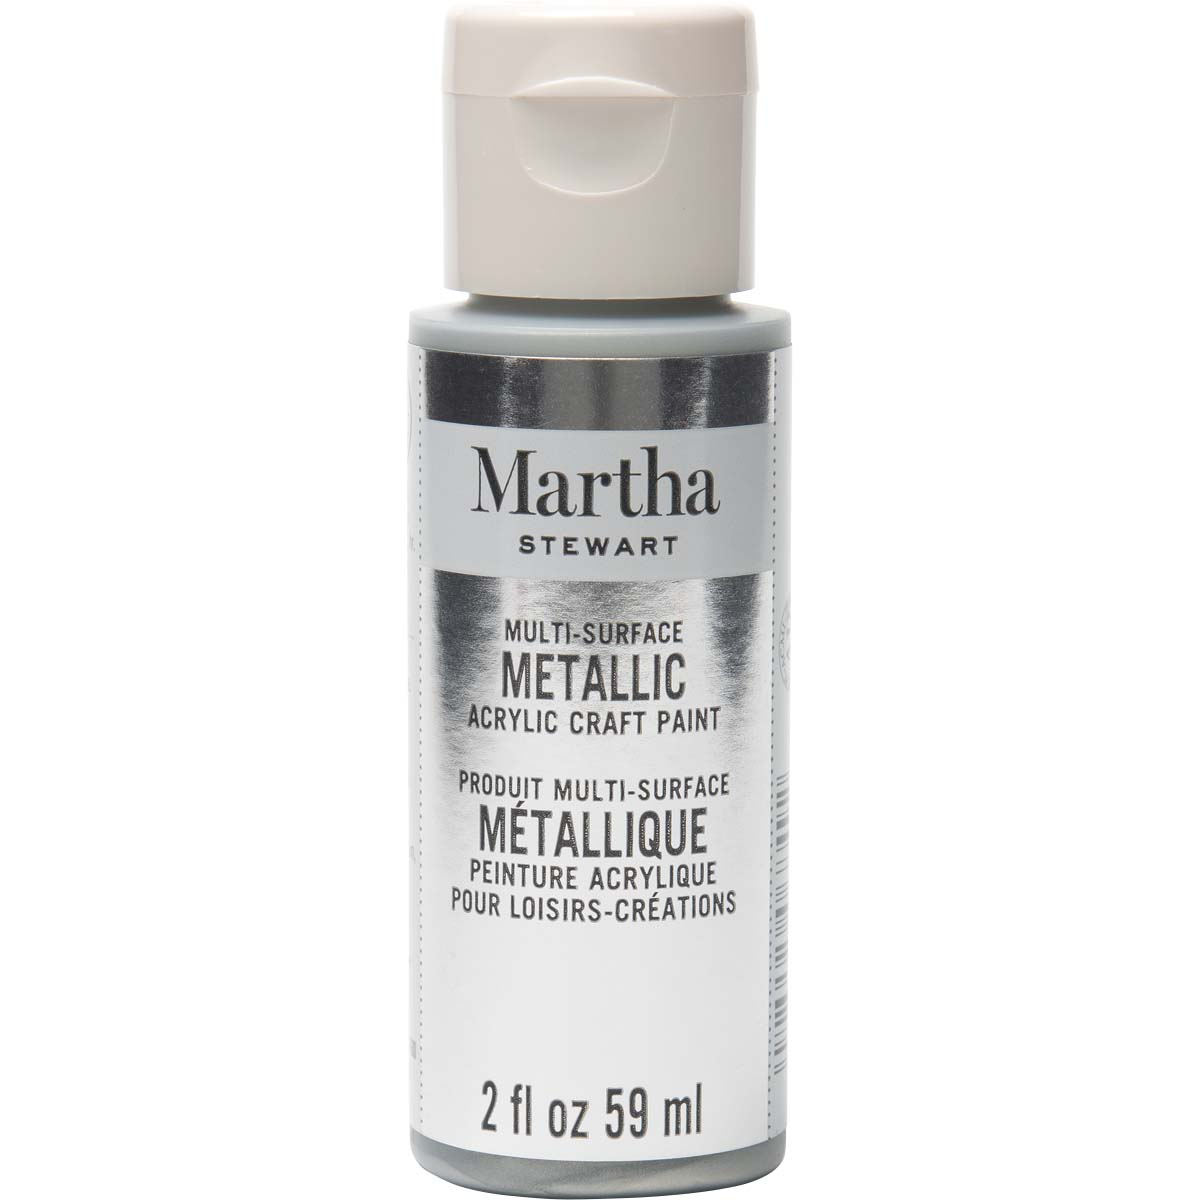 Martha Stewart ® Multi-Surface Metallic Acrylic Craft Paint - Sterling, 2 oz. - 32128CA